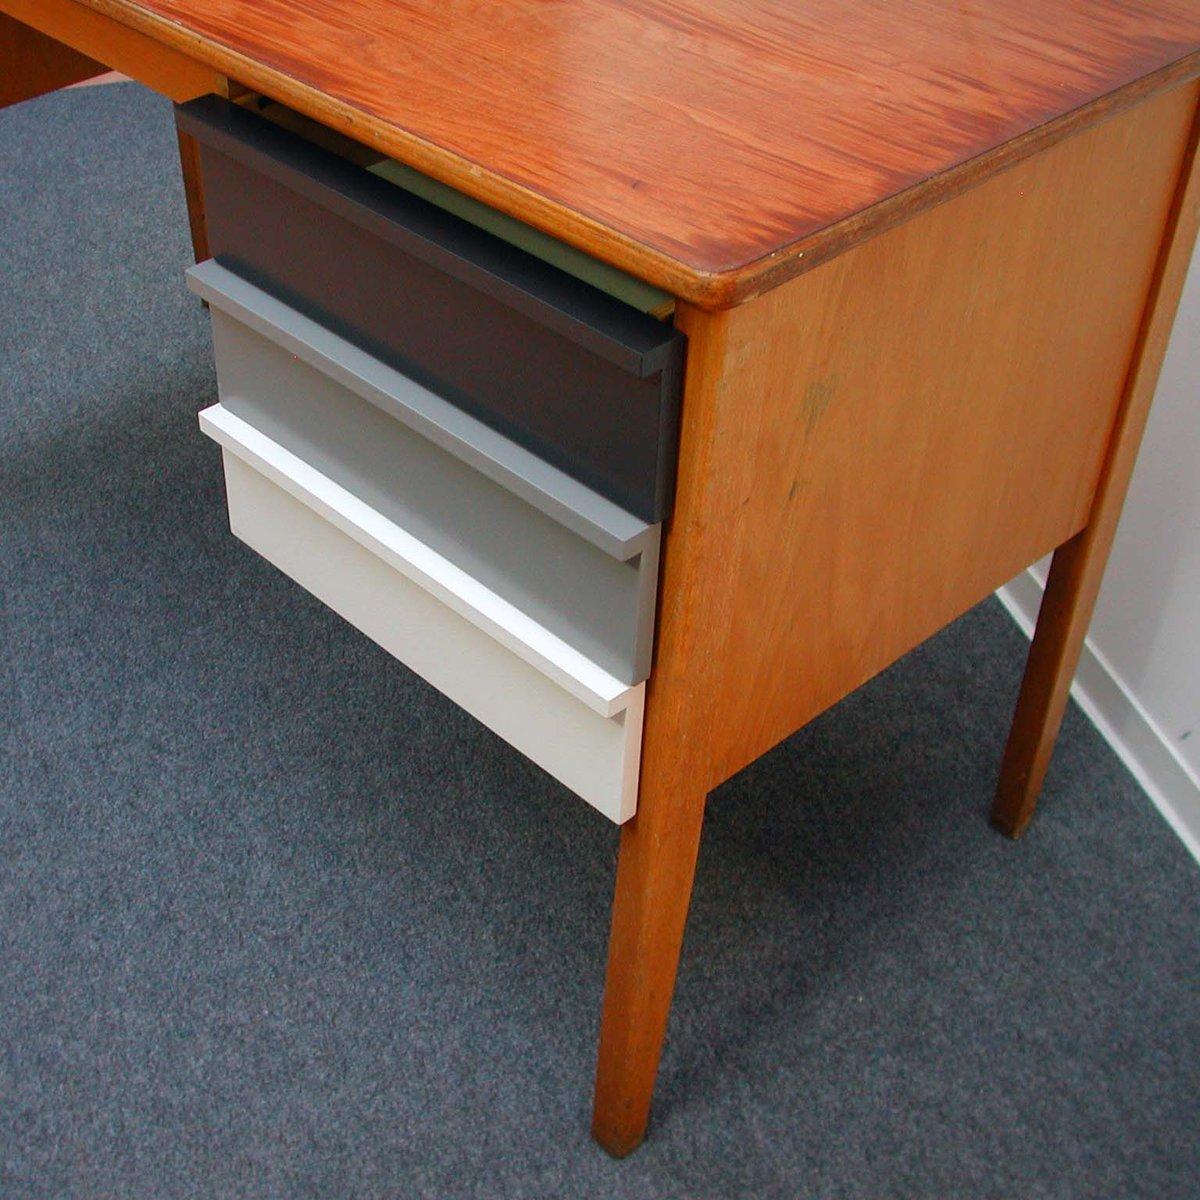 Vintage Wooden Teacher 39 S Desk 1960s For Sale At Pamono